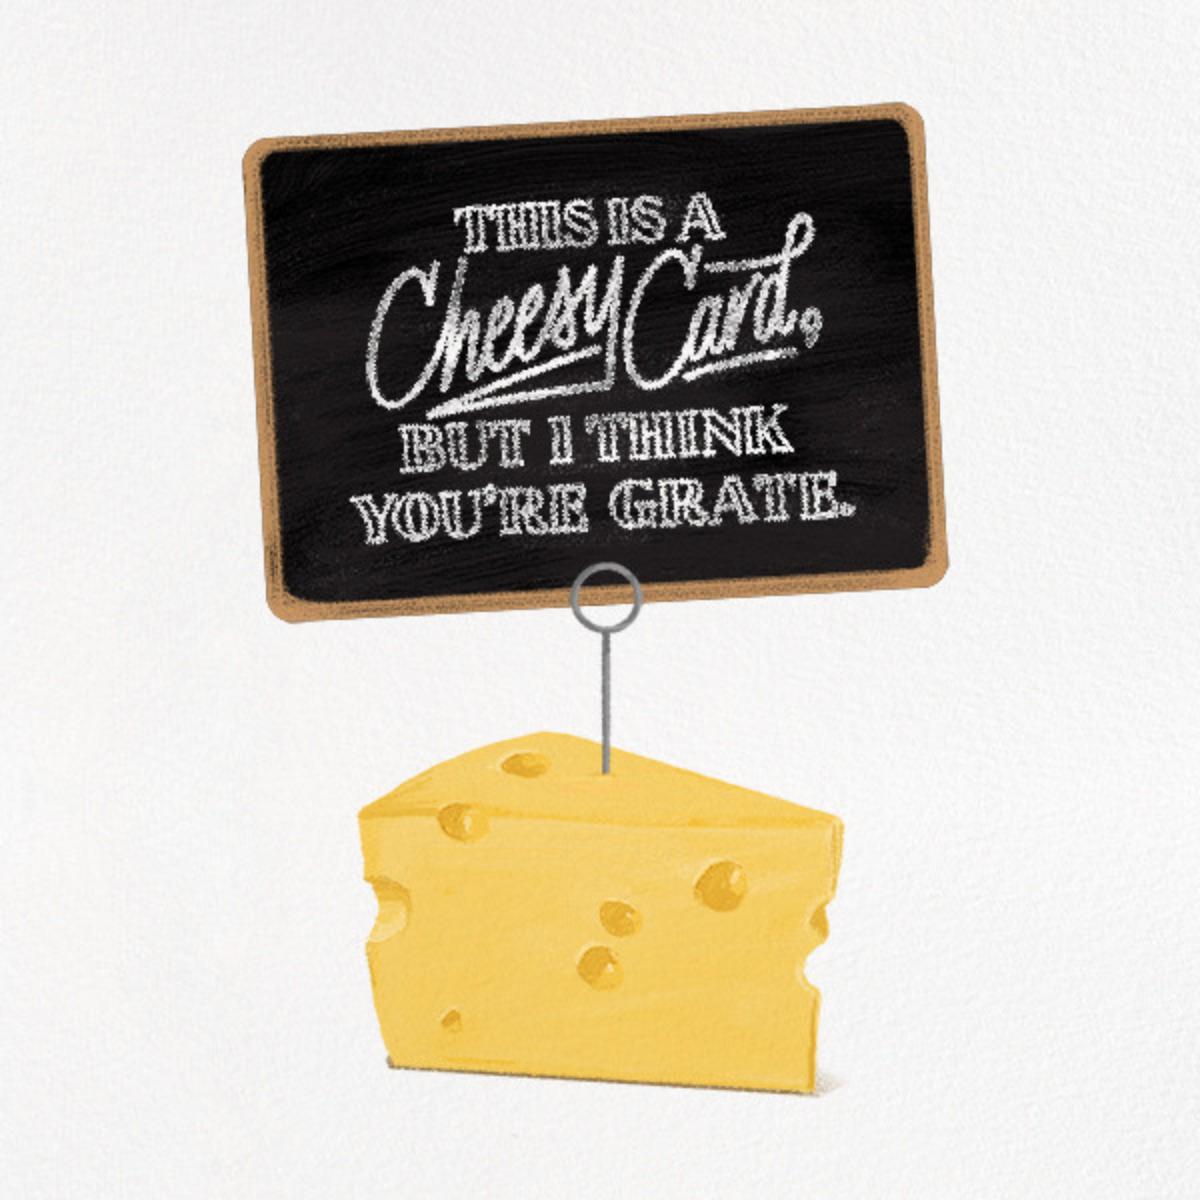 A Cheesy Card - Derek Blasberg - Just because